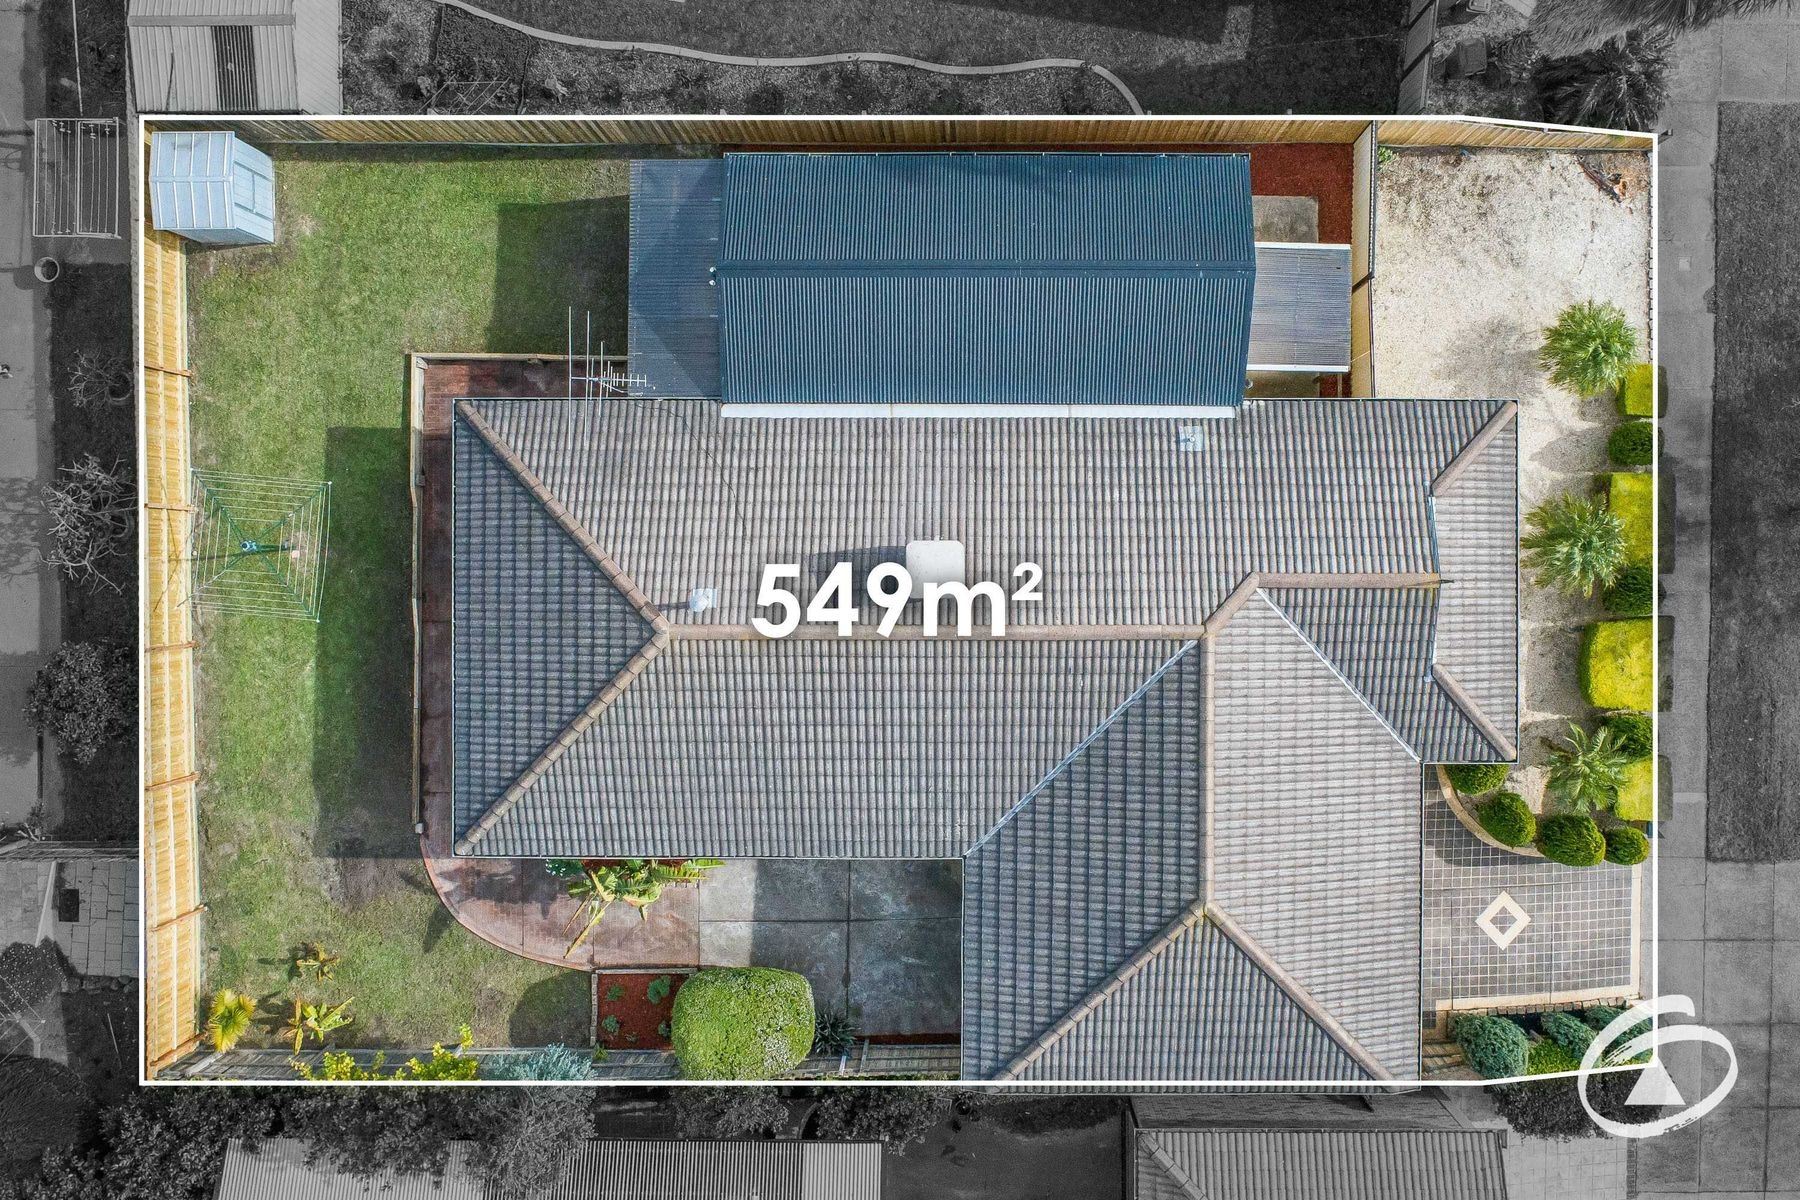 21 Harold Keys Drive, Narre Warren South, VIC 3805